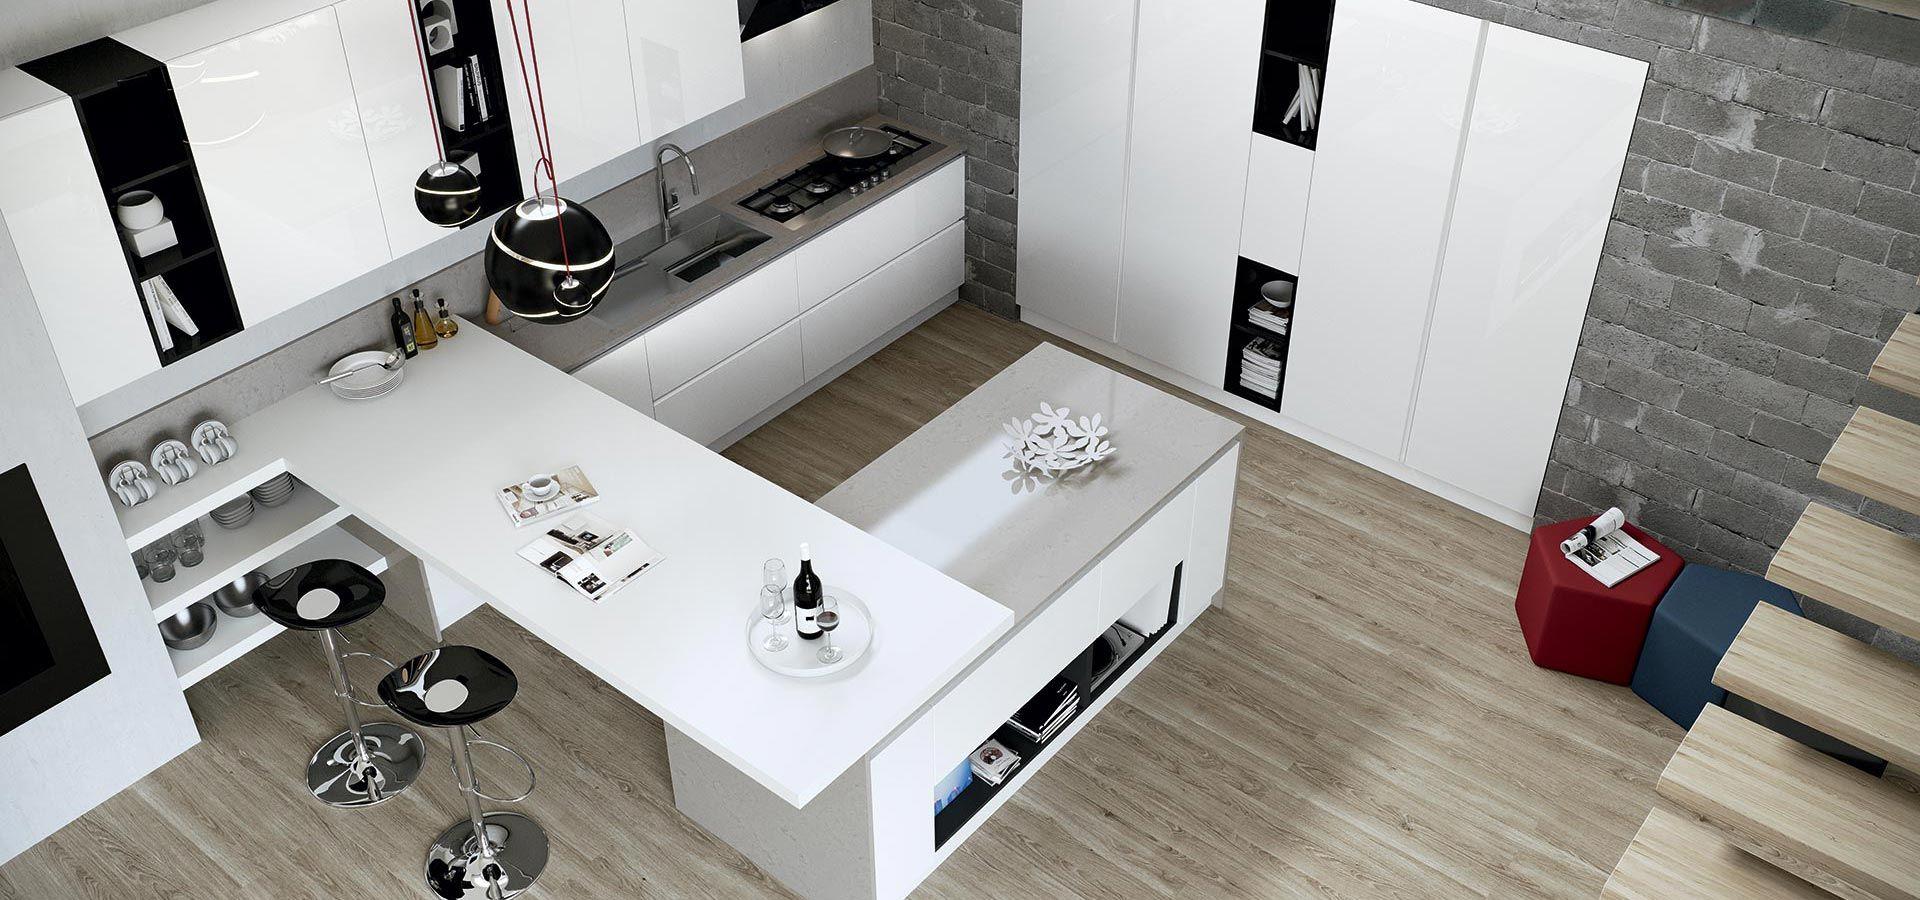 Cucina Moderna - Round Finitura bianco | Vani a giorno nero ...